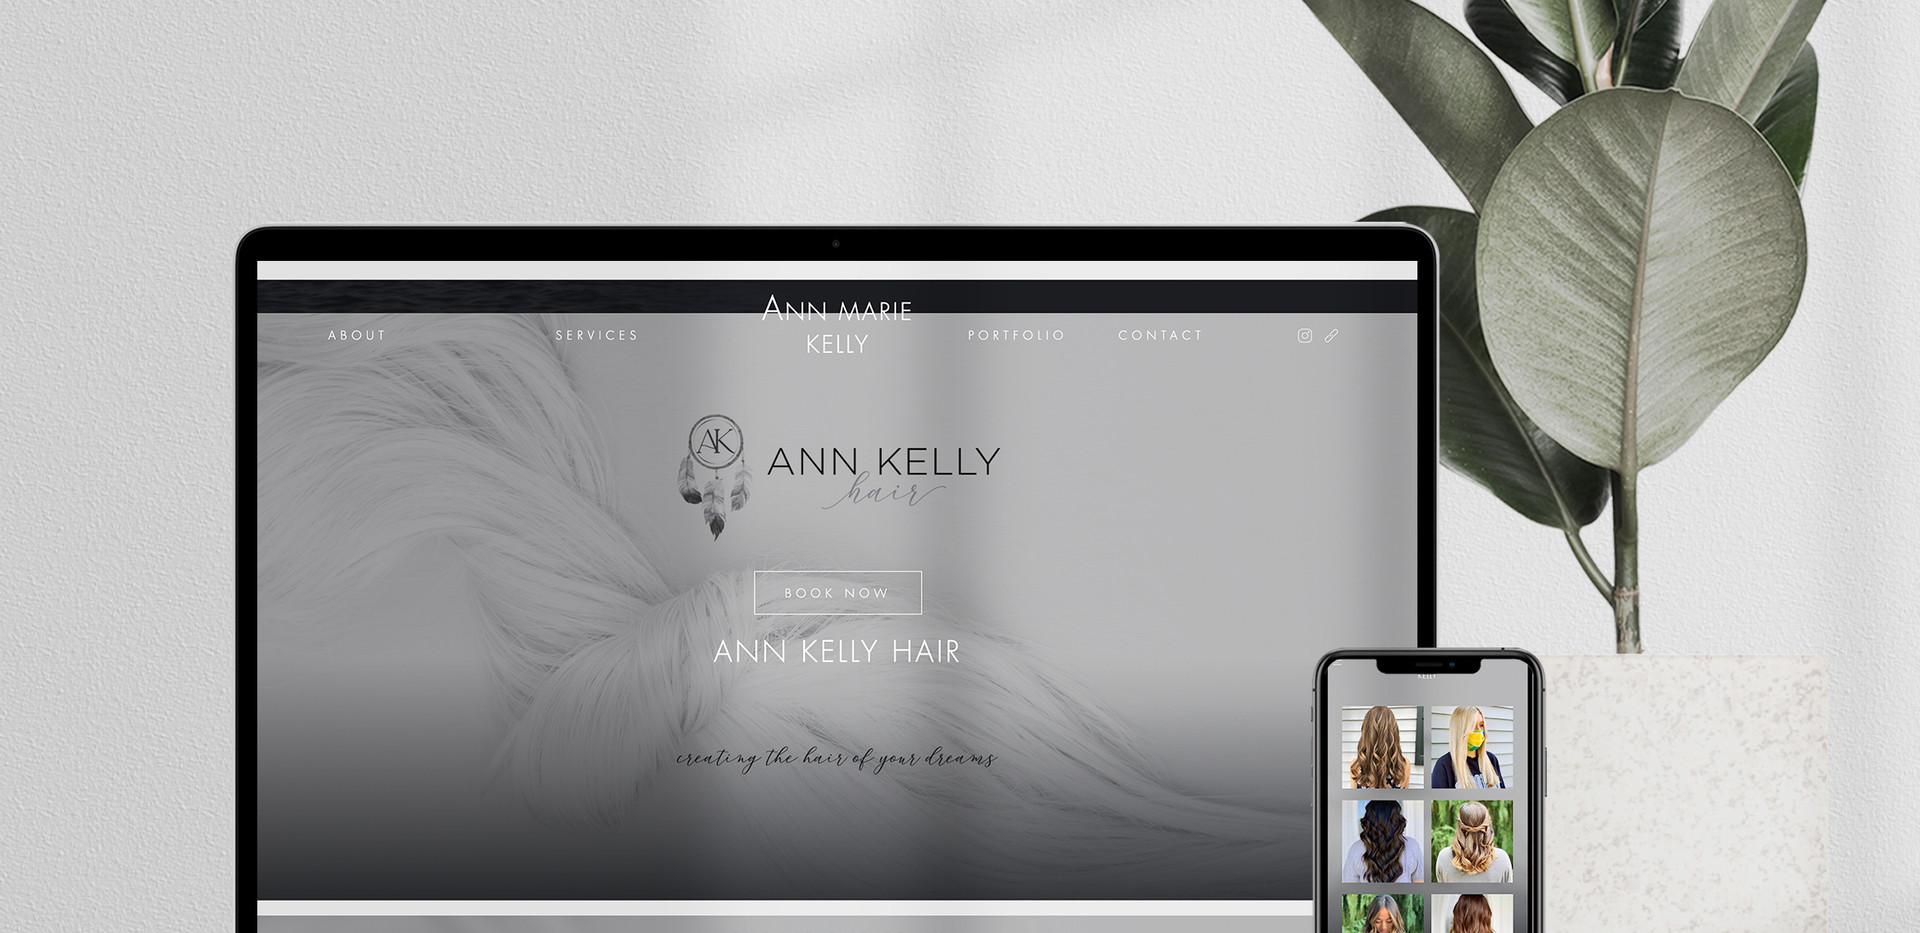 Ann Kelly Hair Gloss Genius Web Page